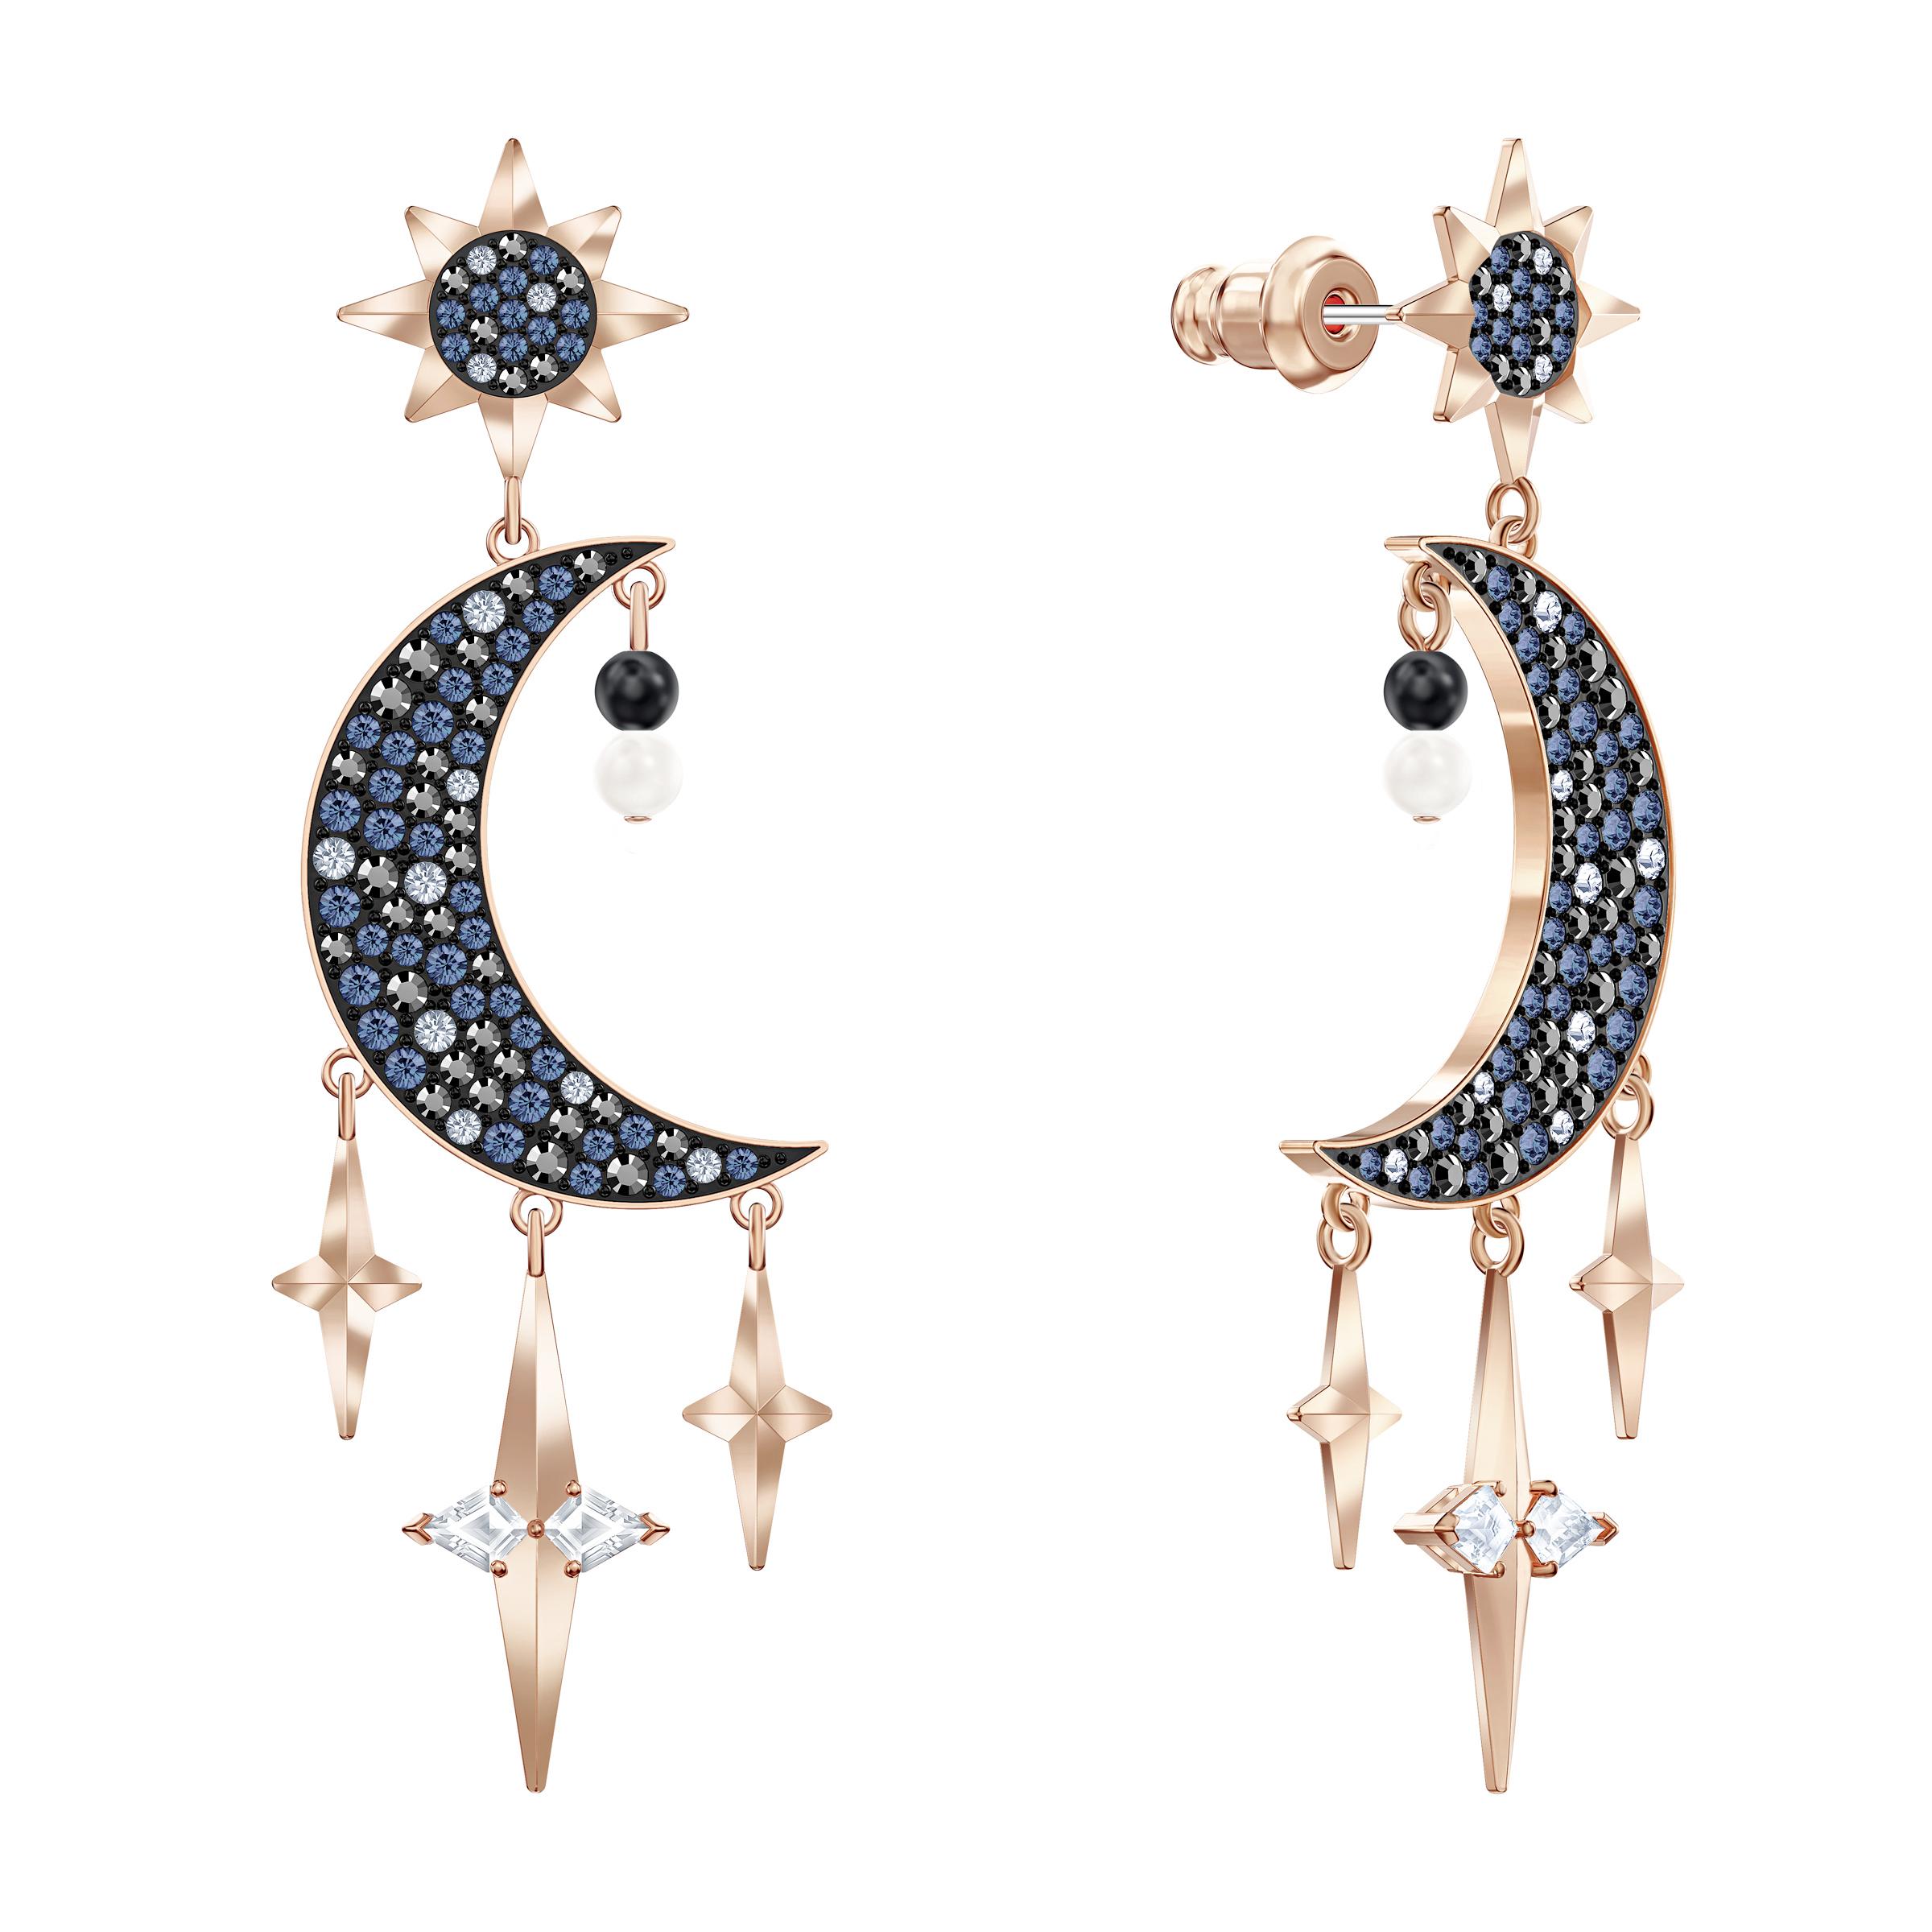 Boucles d'oreilles Swarovski Symbolic, multicolore, Finition mix de métal, Swarovski